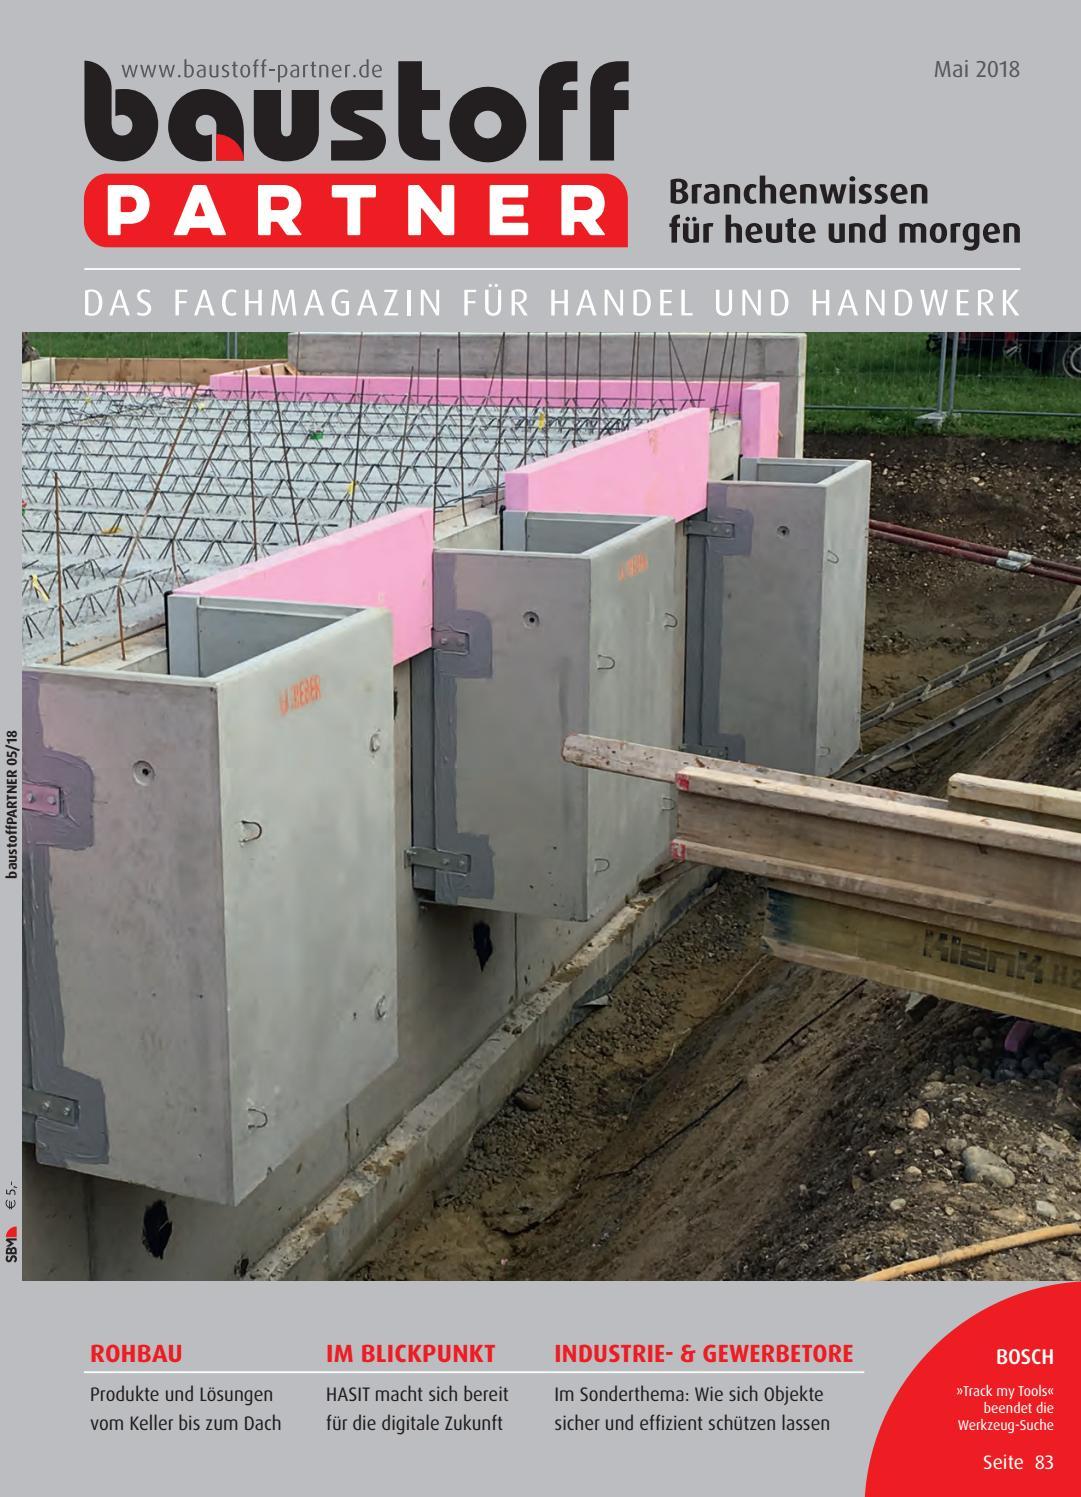 baustoffPARTNER Mai 2018 by SBM Verlag GmbH - issuu